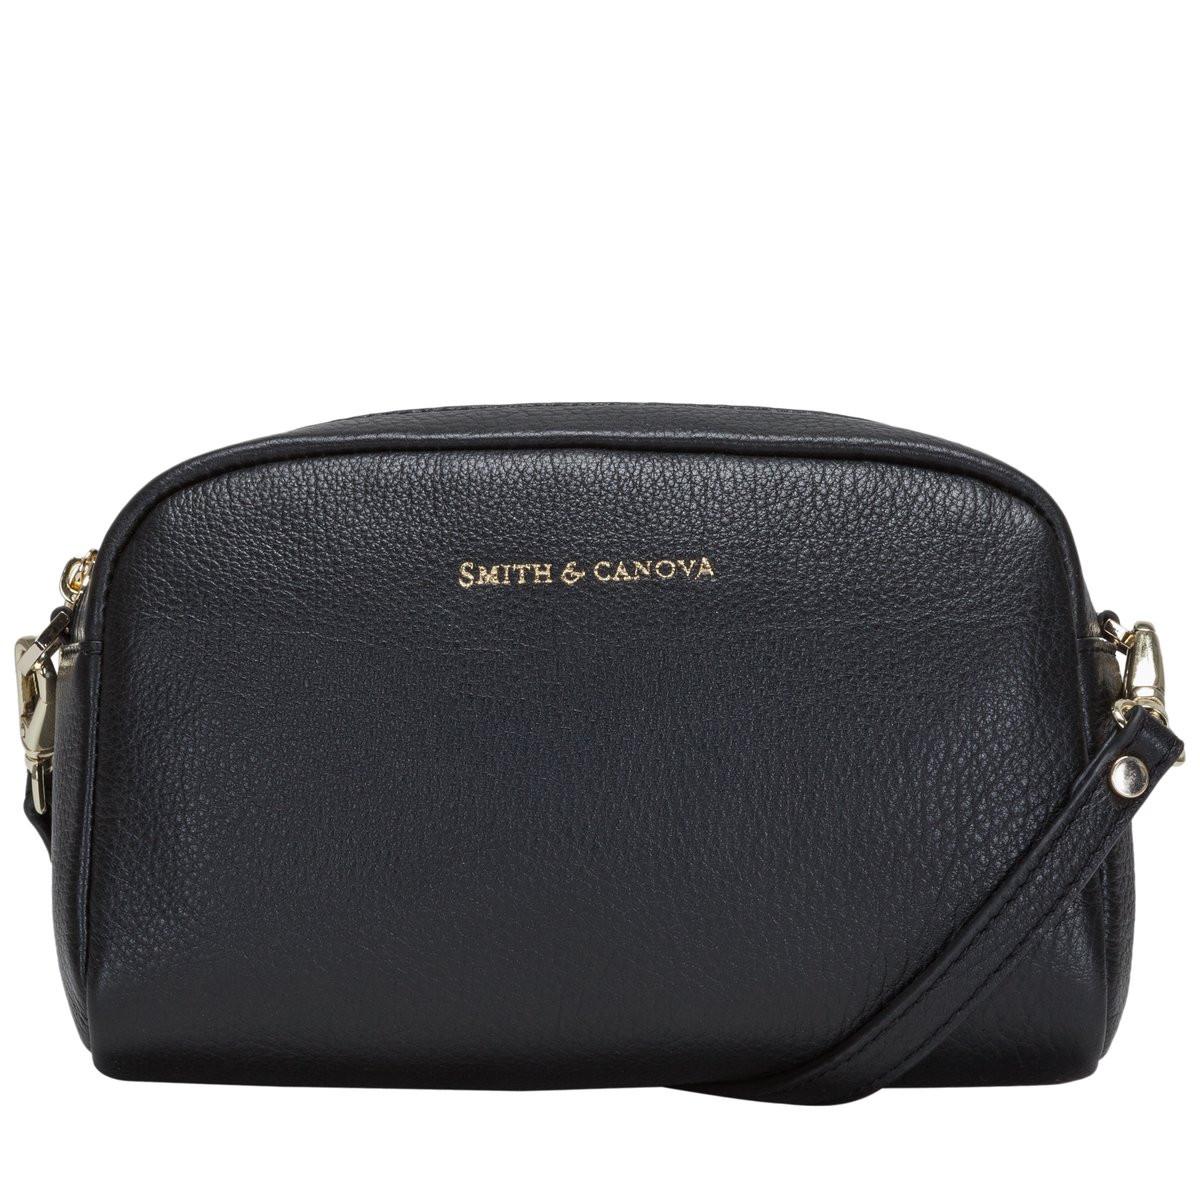 ec8d31750c0 Small Soft Leather Zip Top Crossbody Bag - Smith & Canova